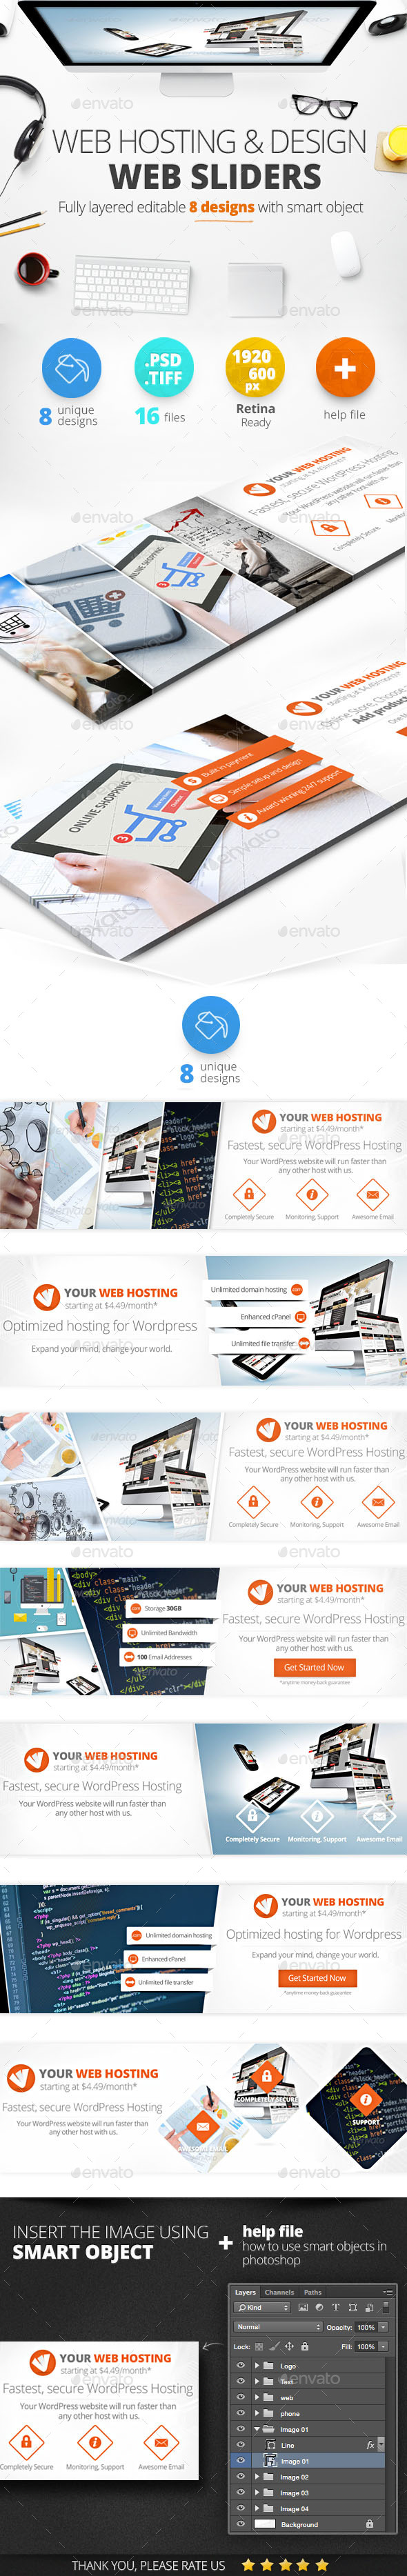 Web Hosting & Design Web Sliders 8 Designs - Sliders & Features Web Elements